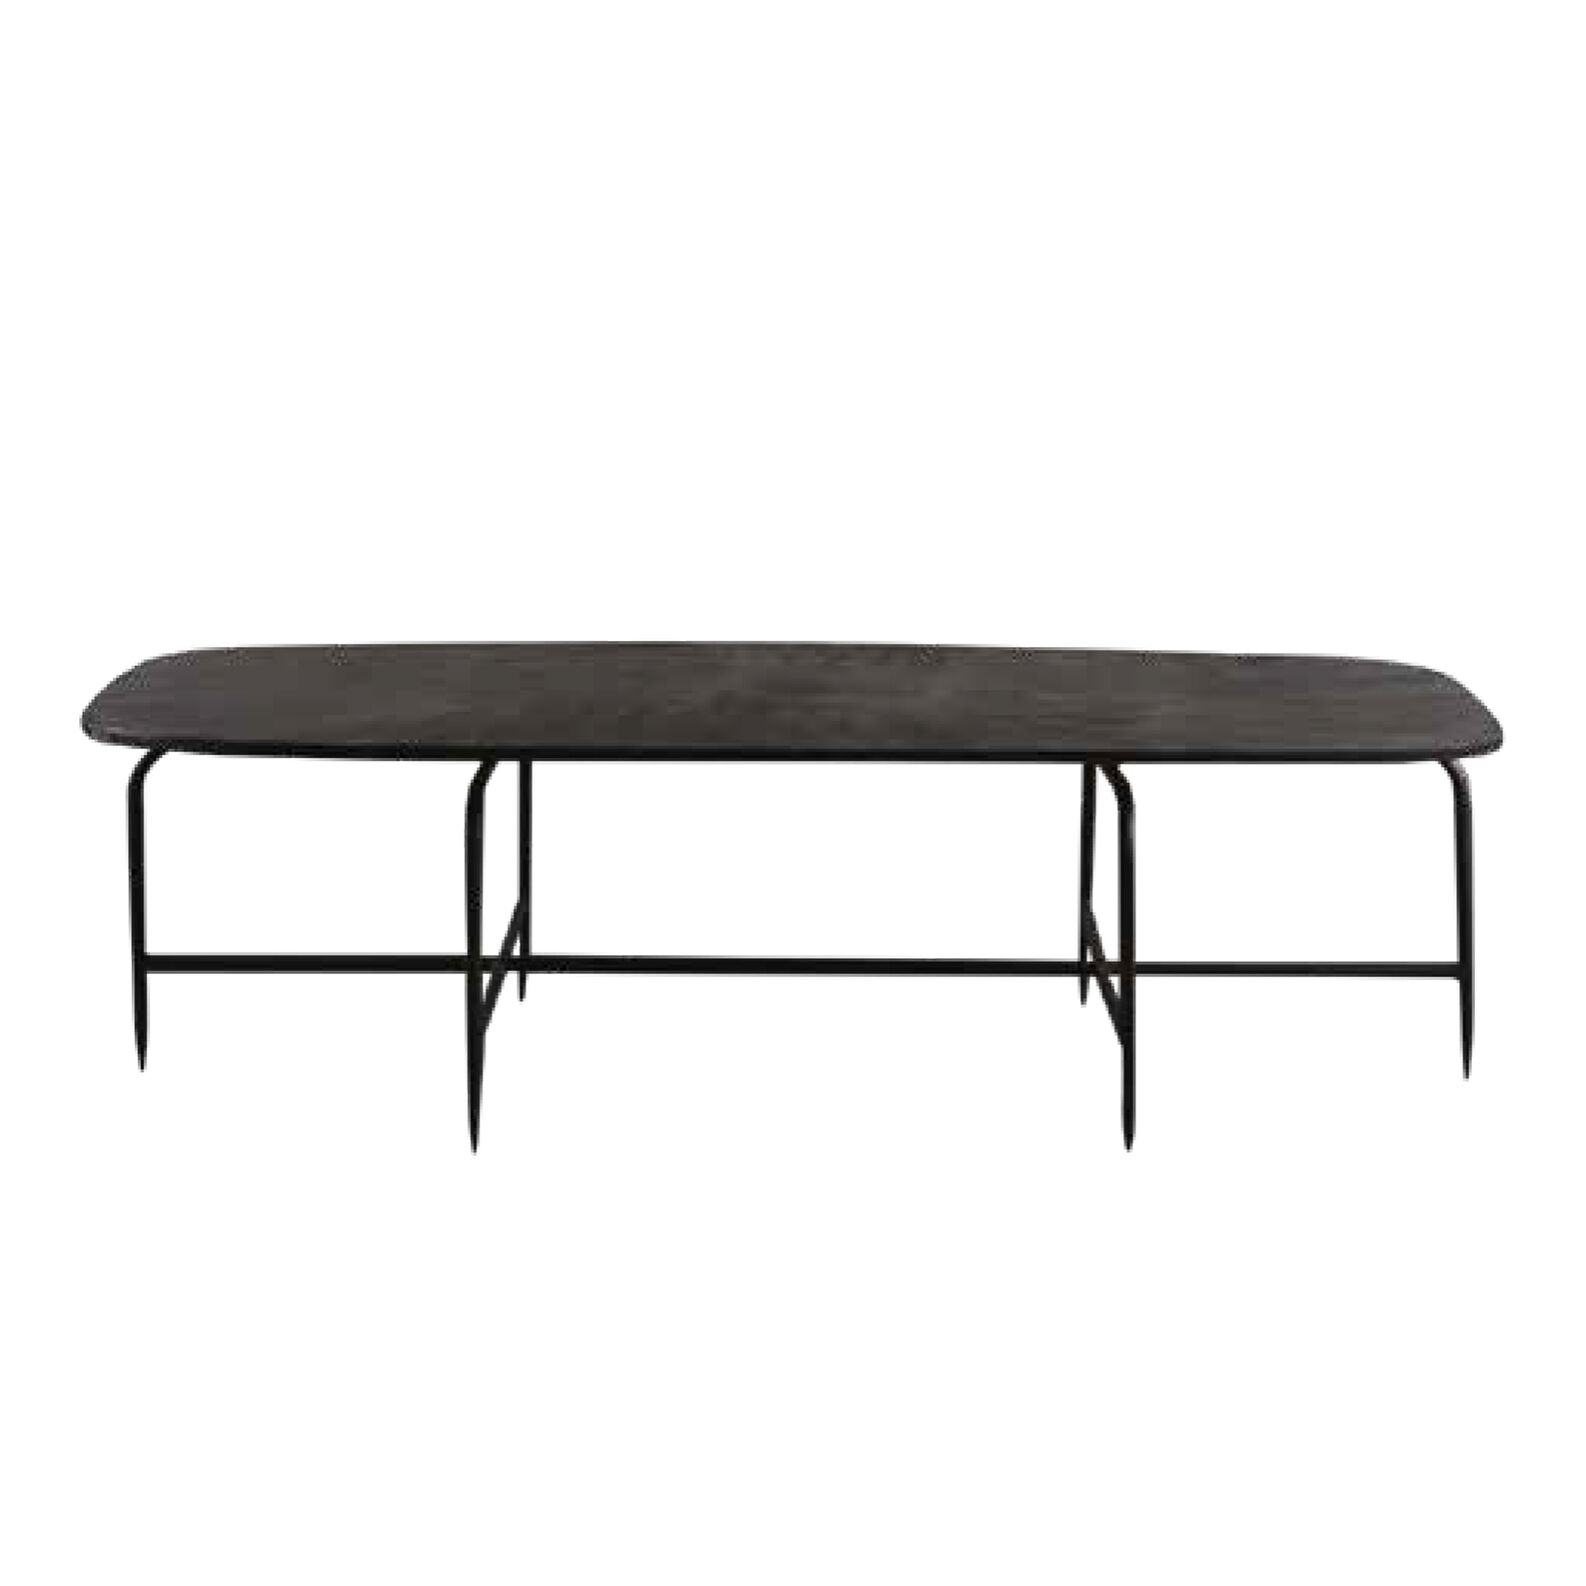 Cargo Ambra coffe table